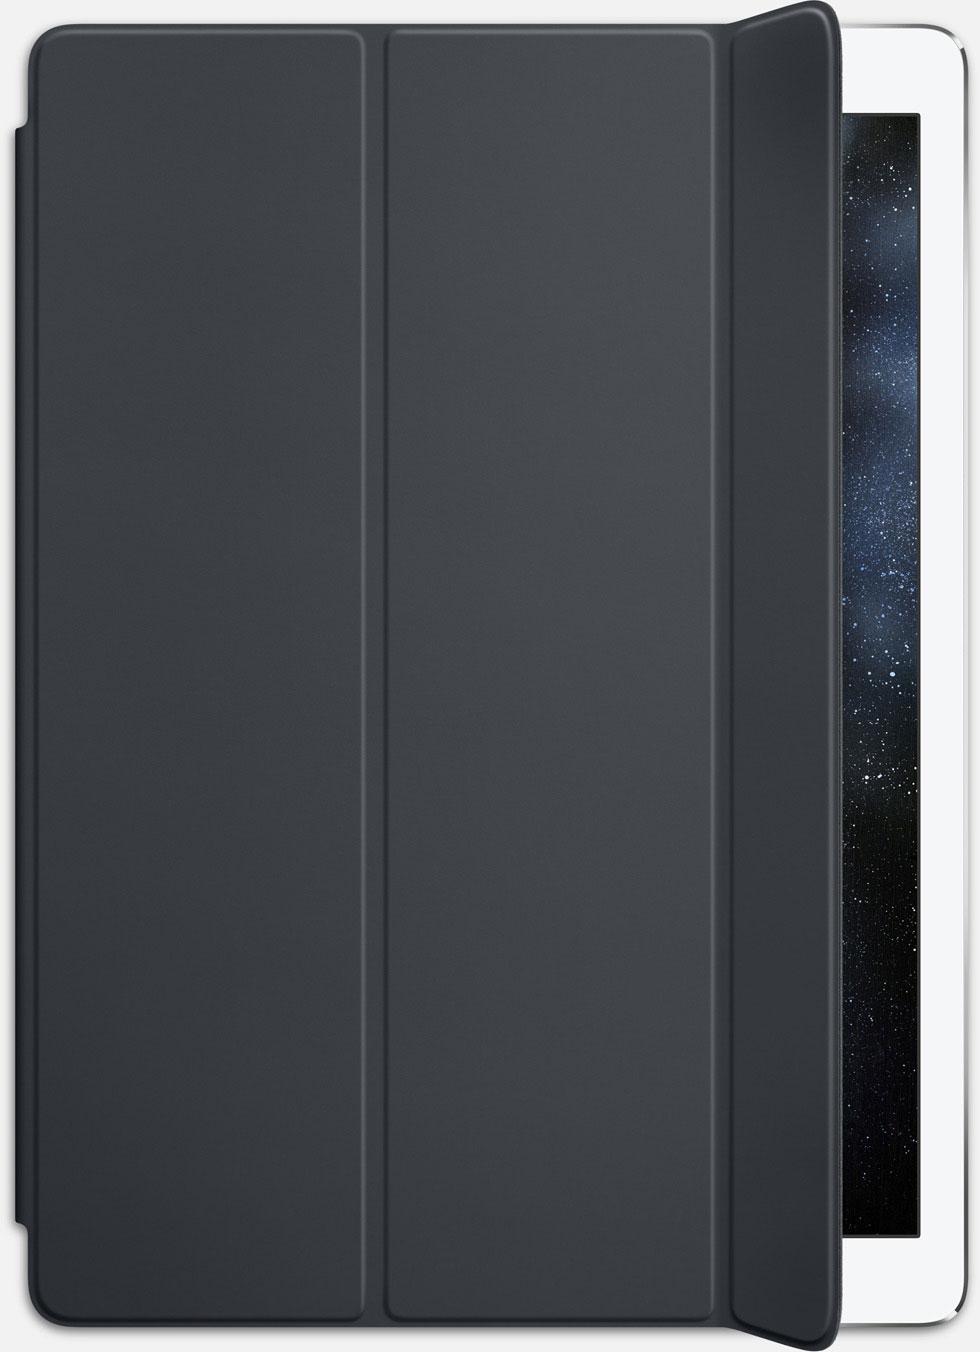 iPad Pro hoezen grijs